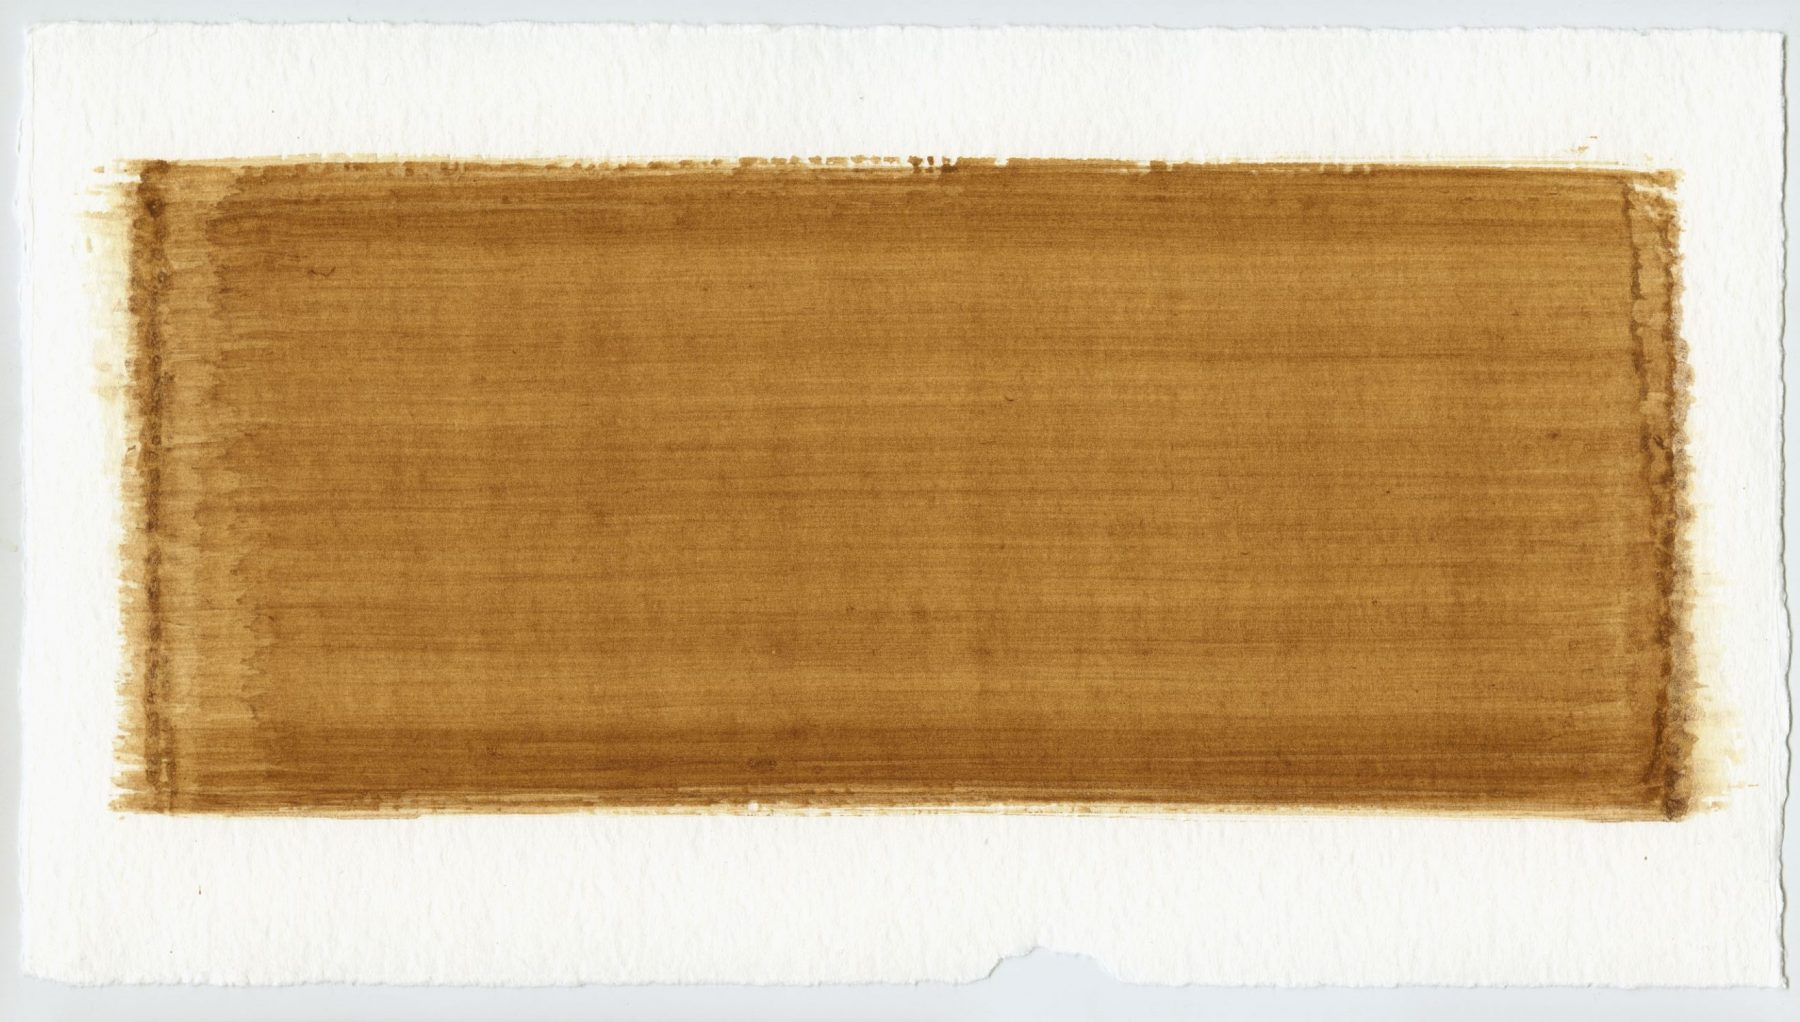 Brush stroke no. 6 - Selfmade pigment: IJzeroer